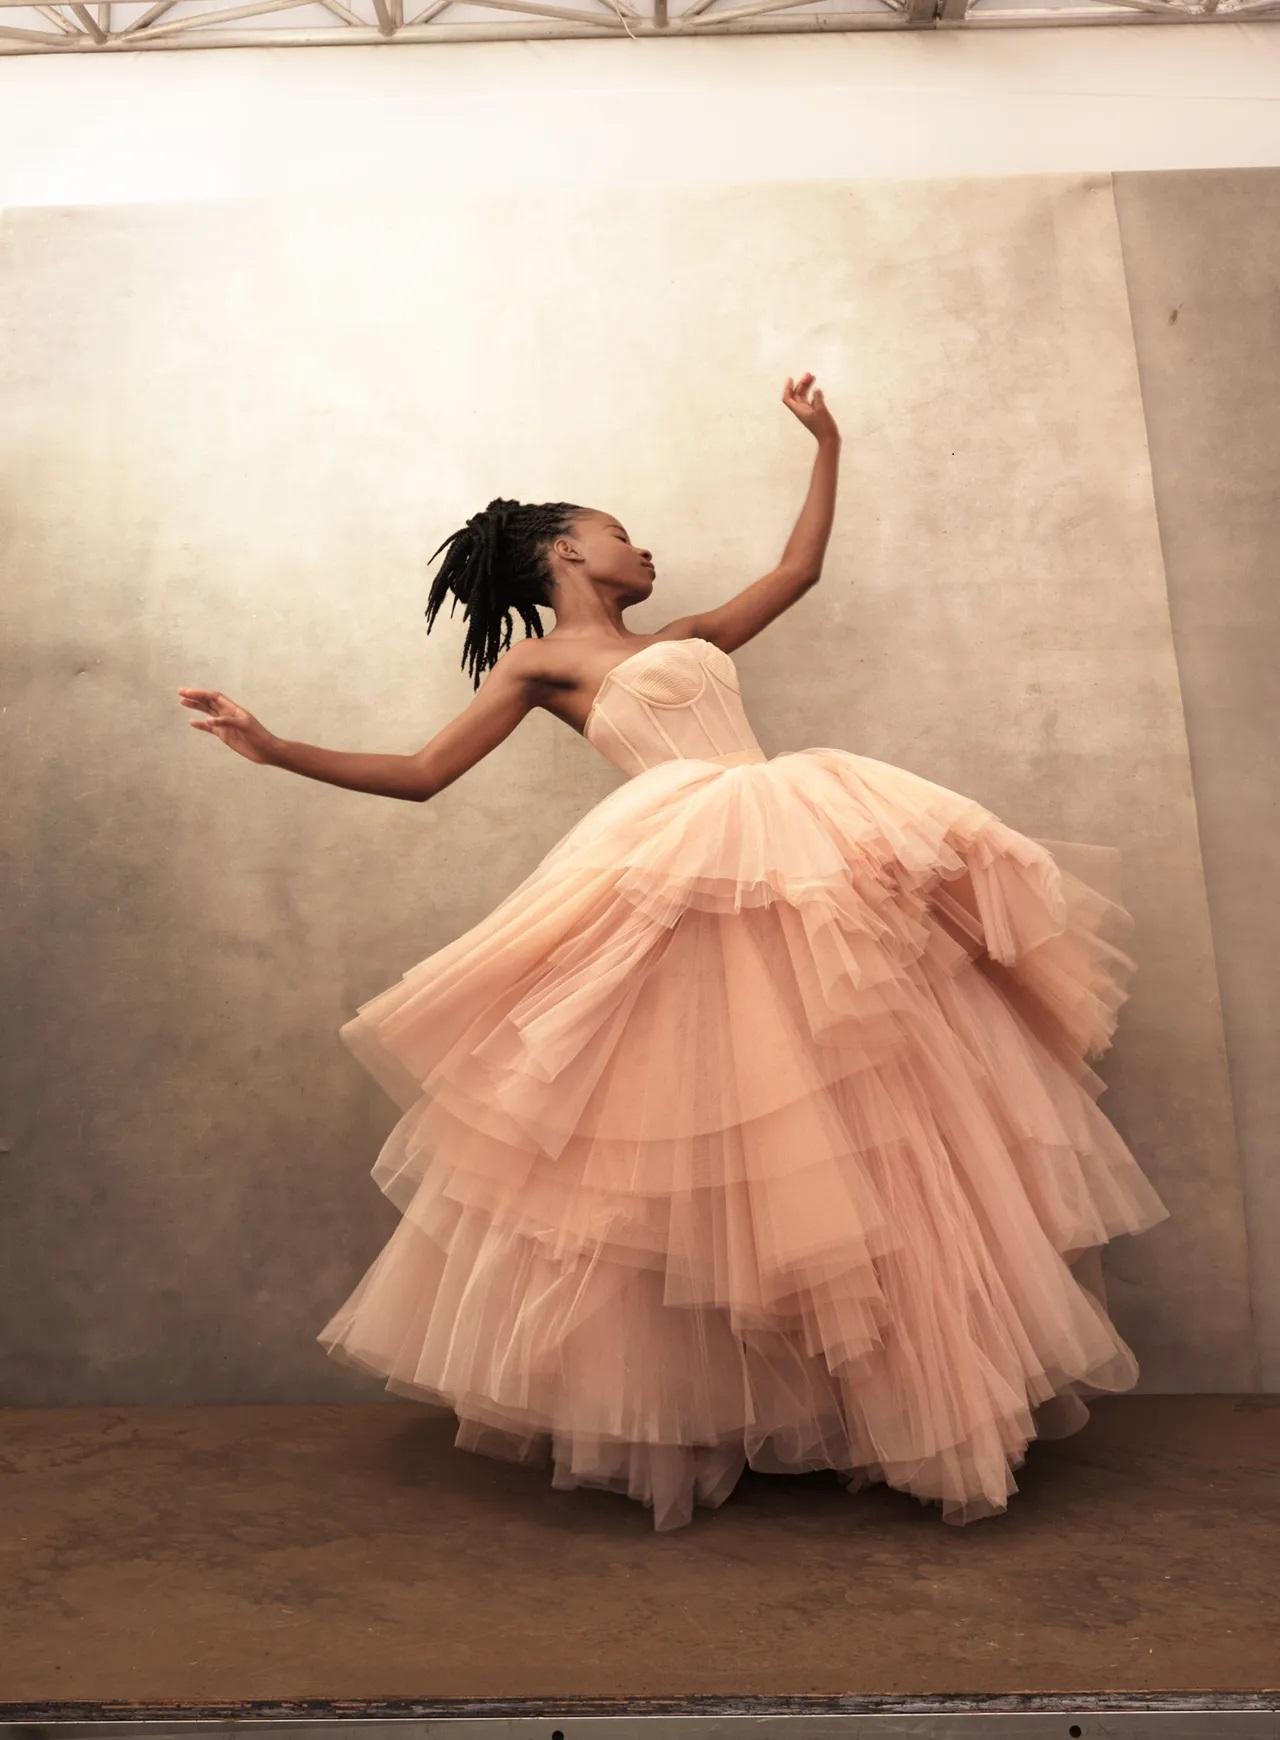 Amanda-Gorman-Vogue-magazine-cover-may-issue-love-photo